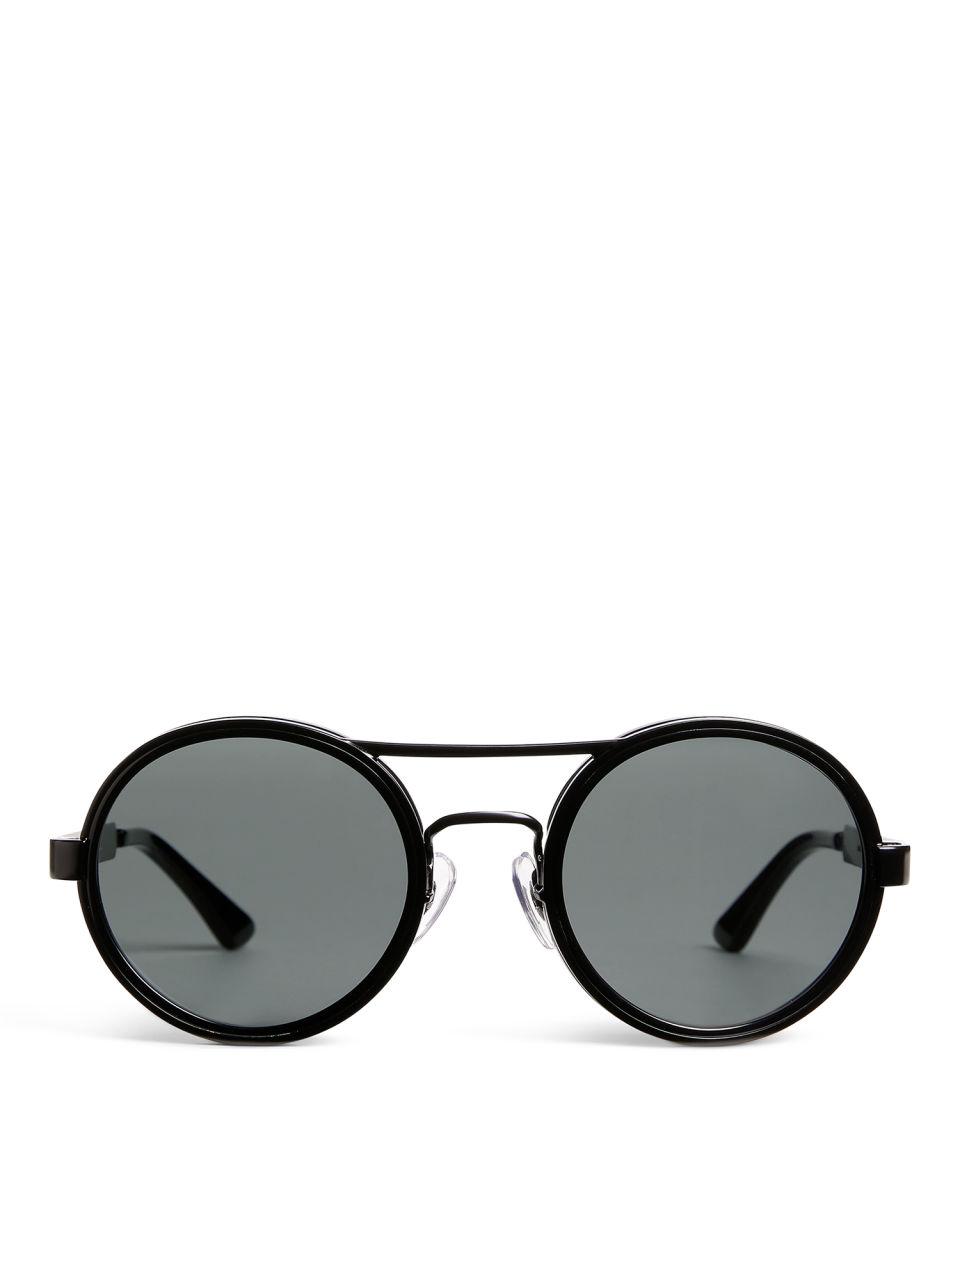 Round Aviator Sunglasses - Black